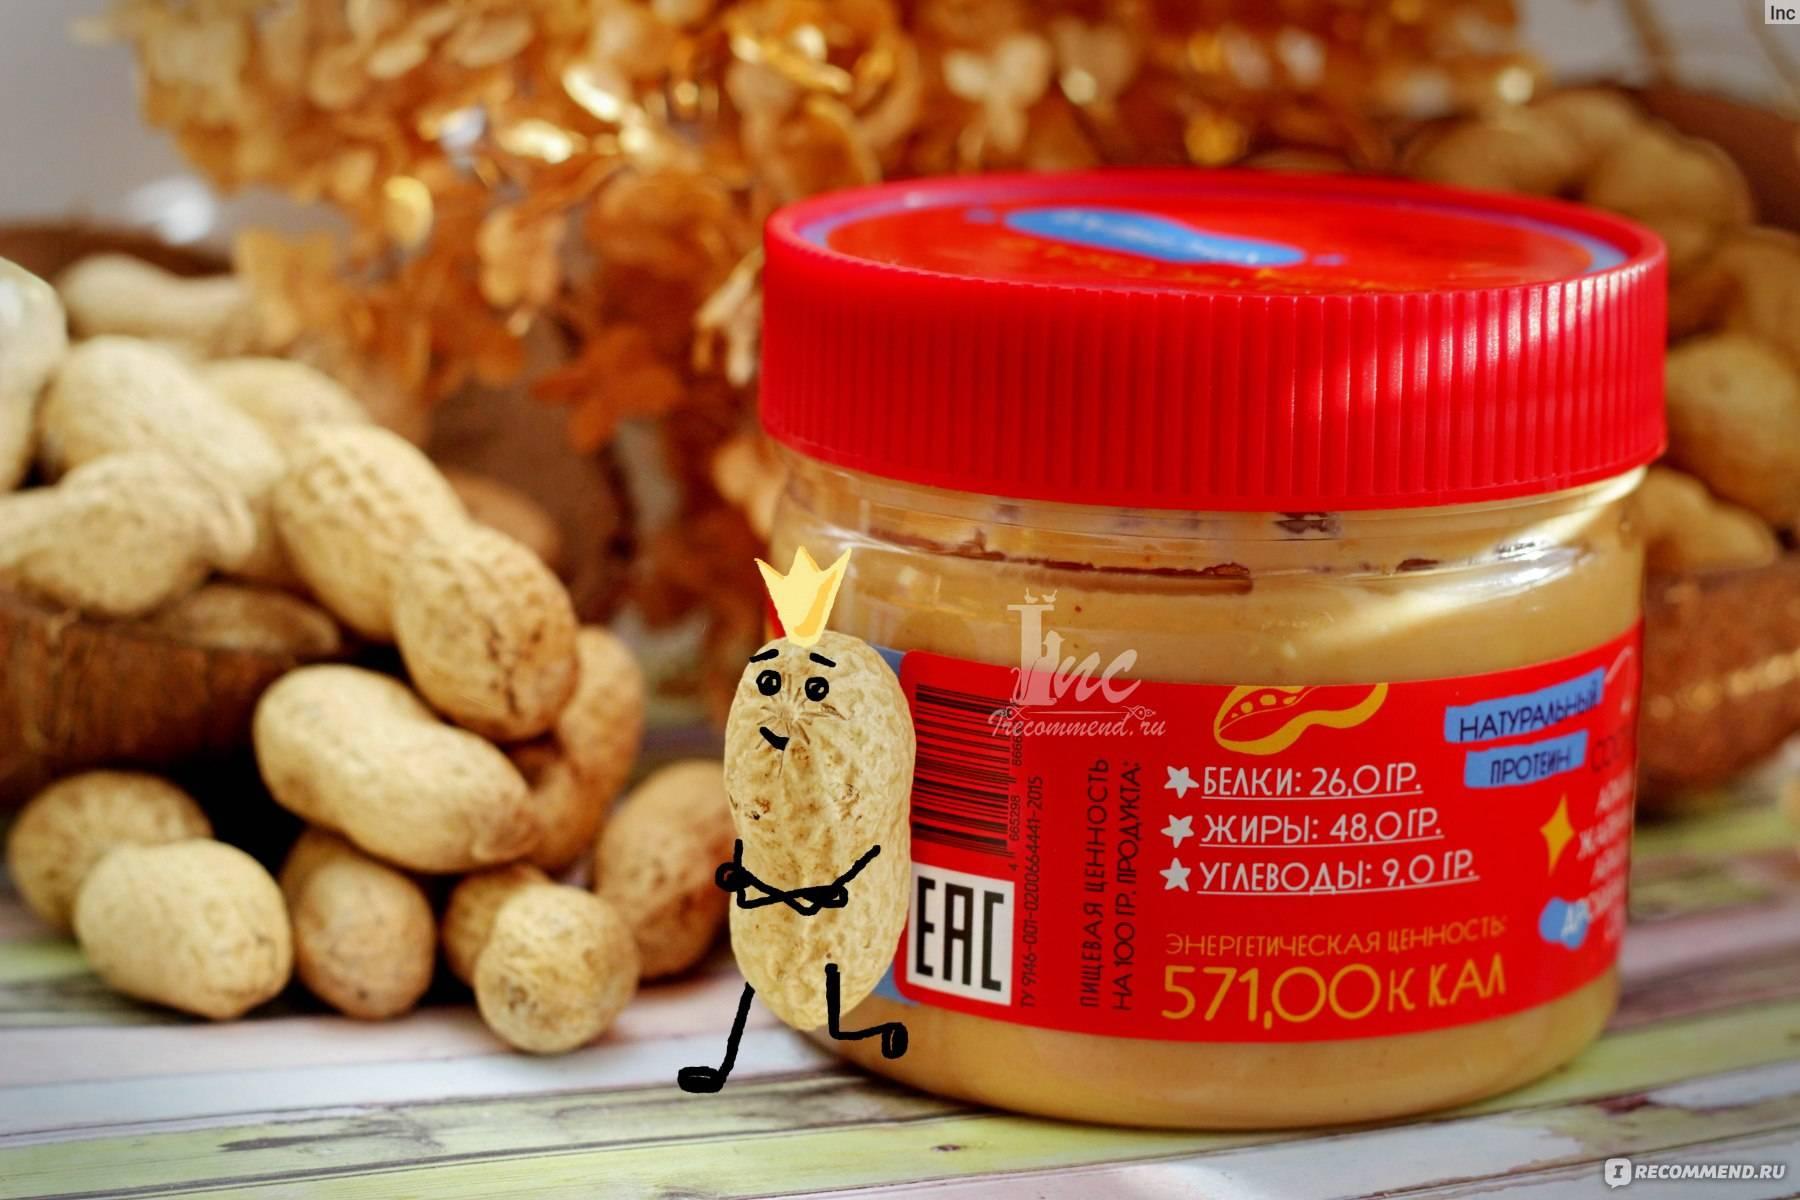 Можно ли собакам орехи фундук — про кур